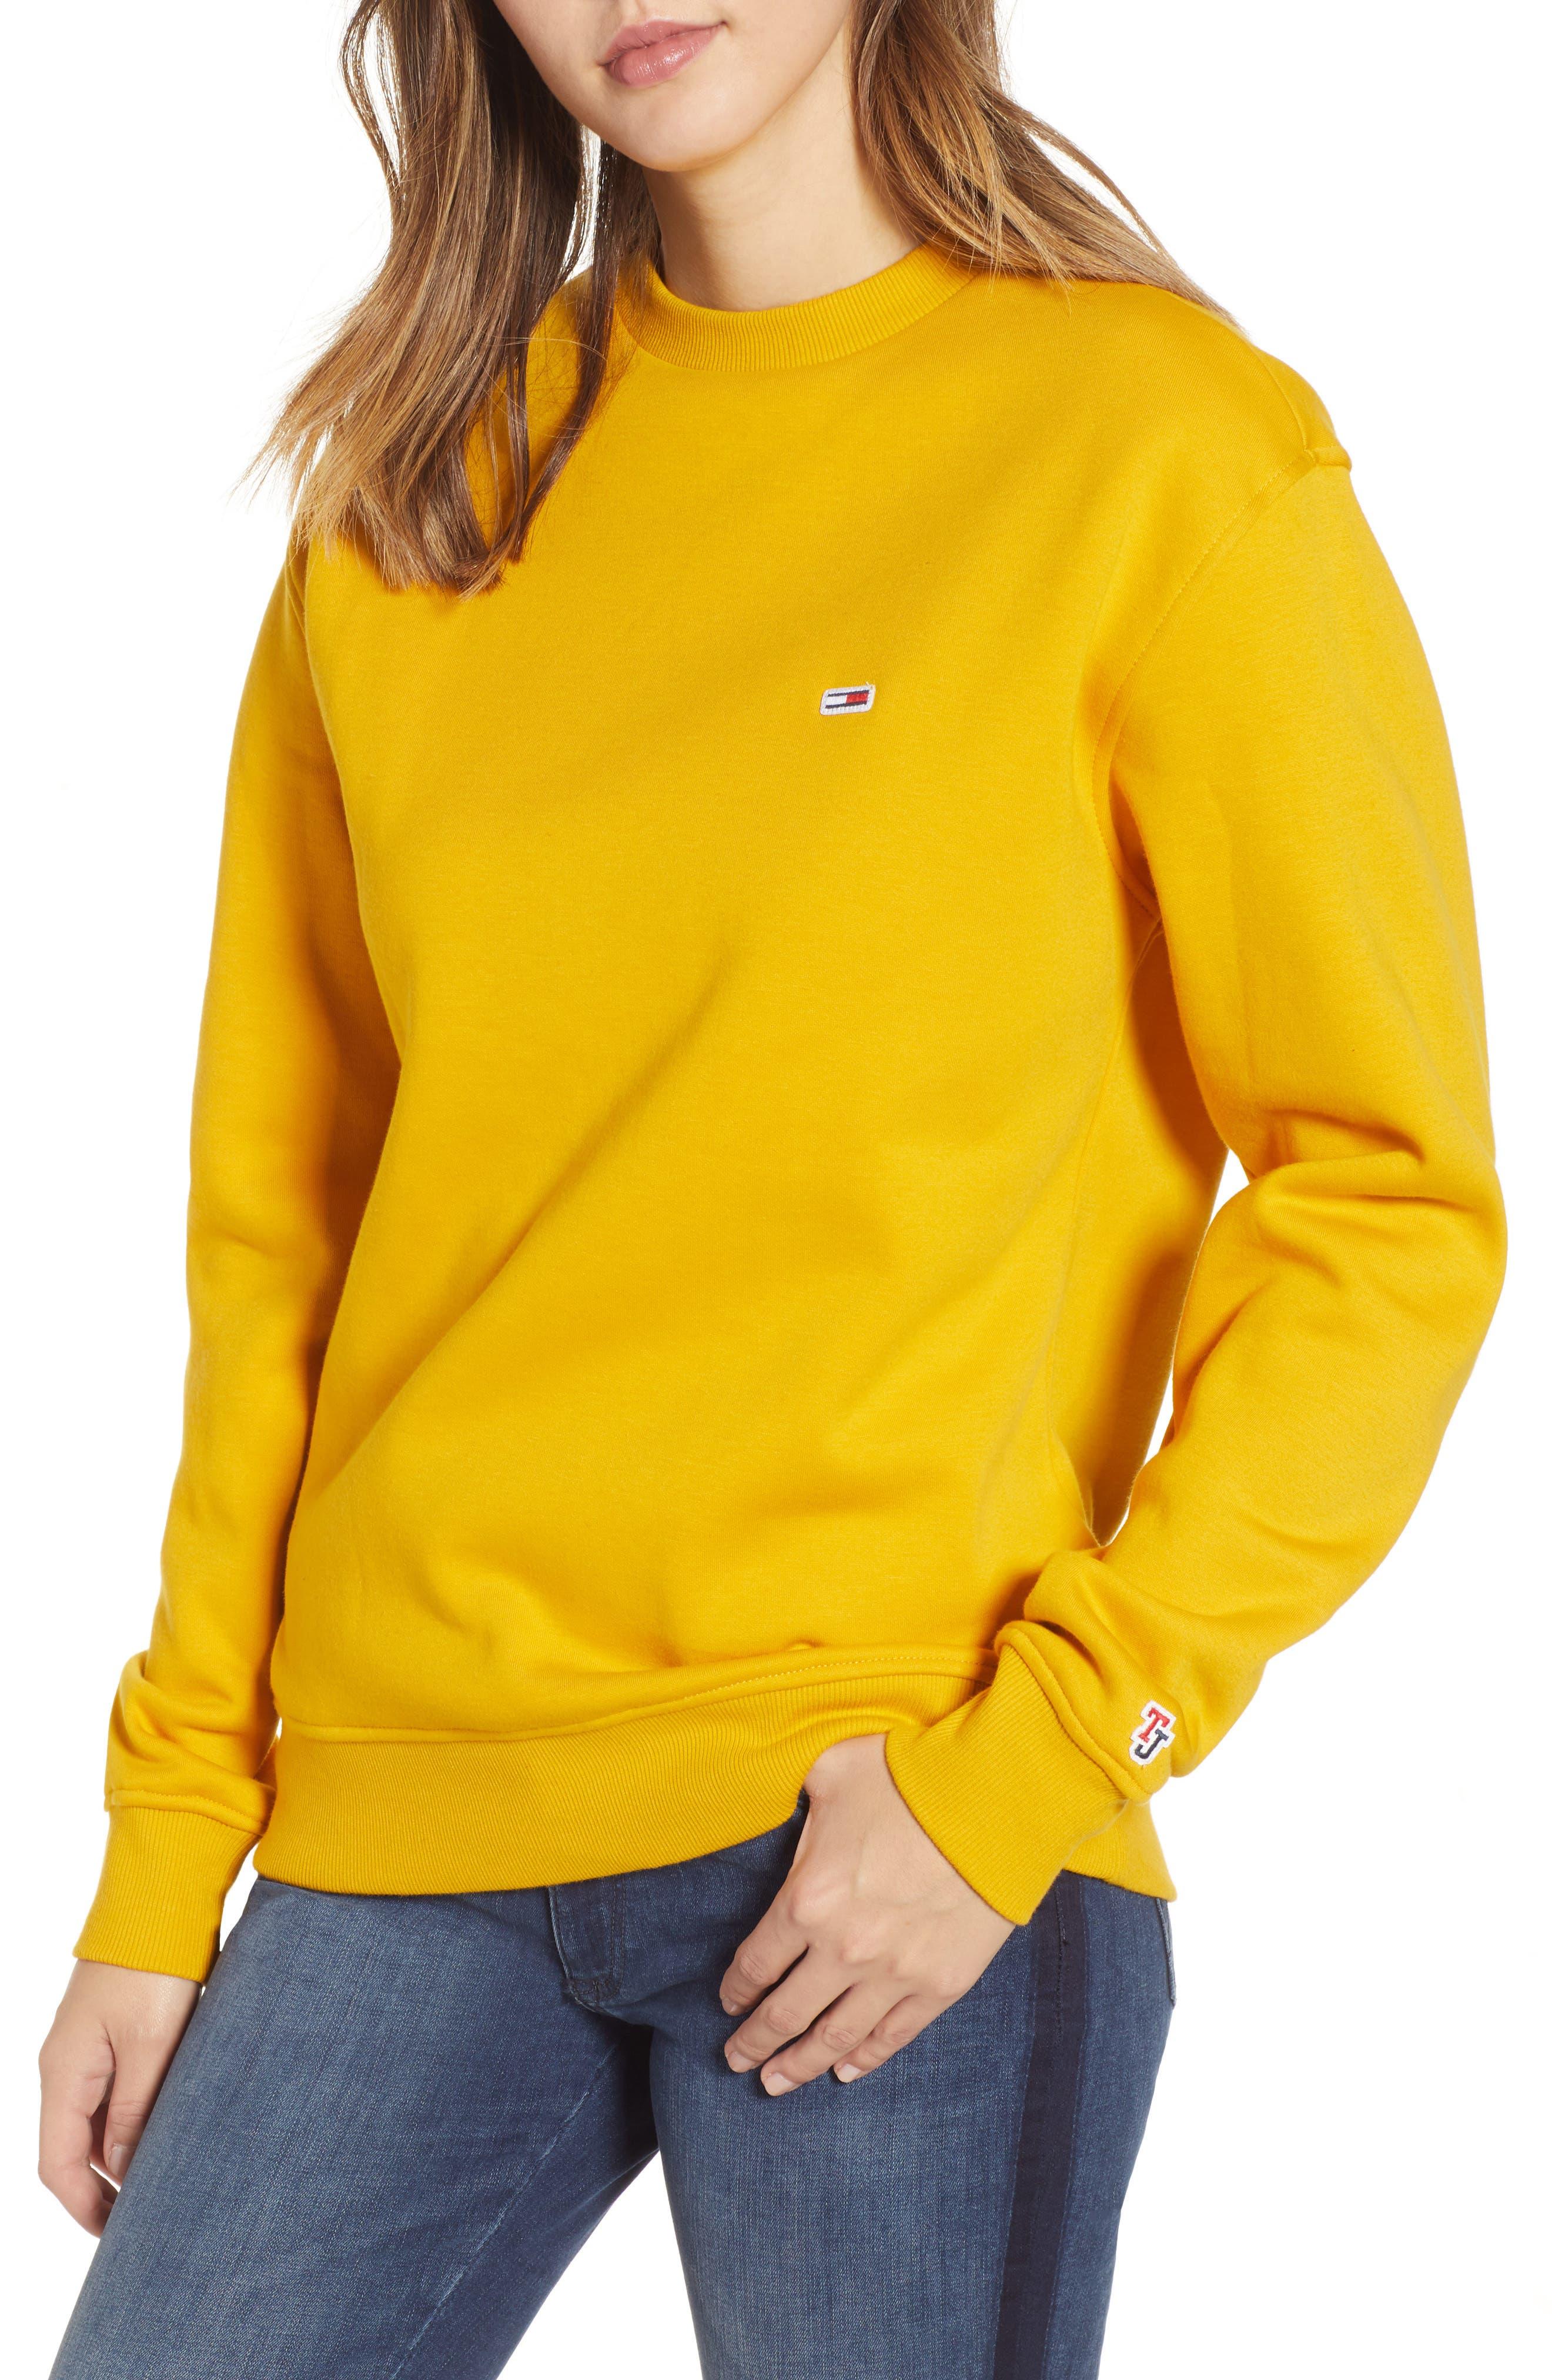 TJW Tommy Classics Sweatshirt,                         Main,                         color, 701